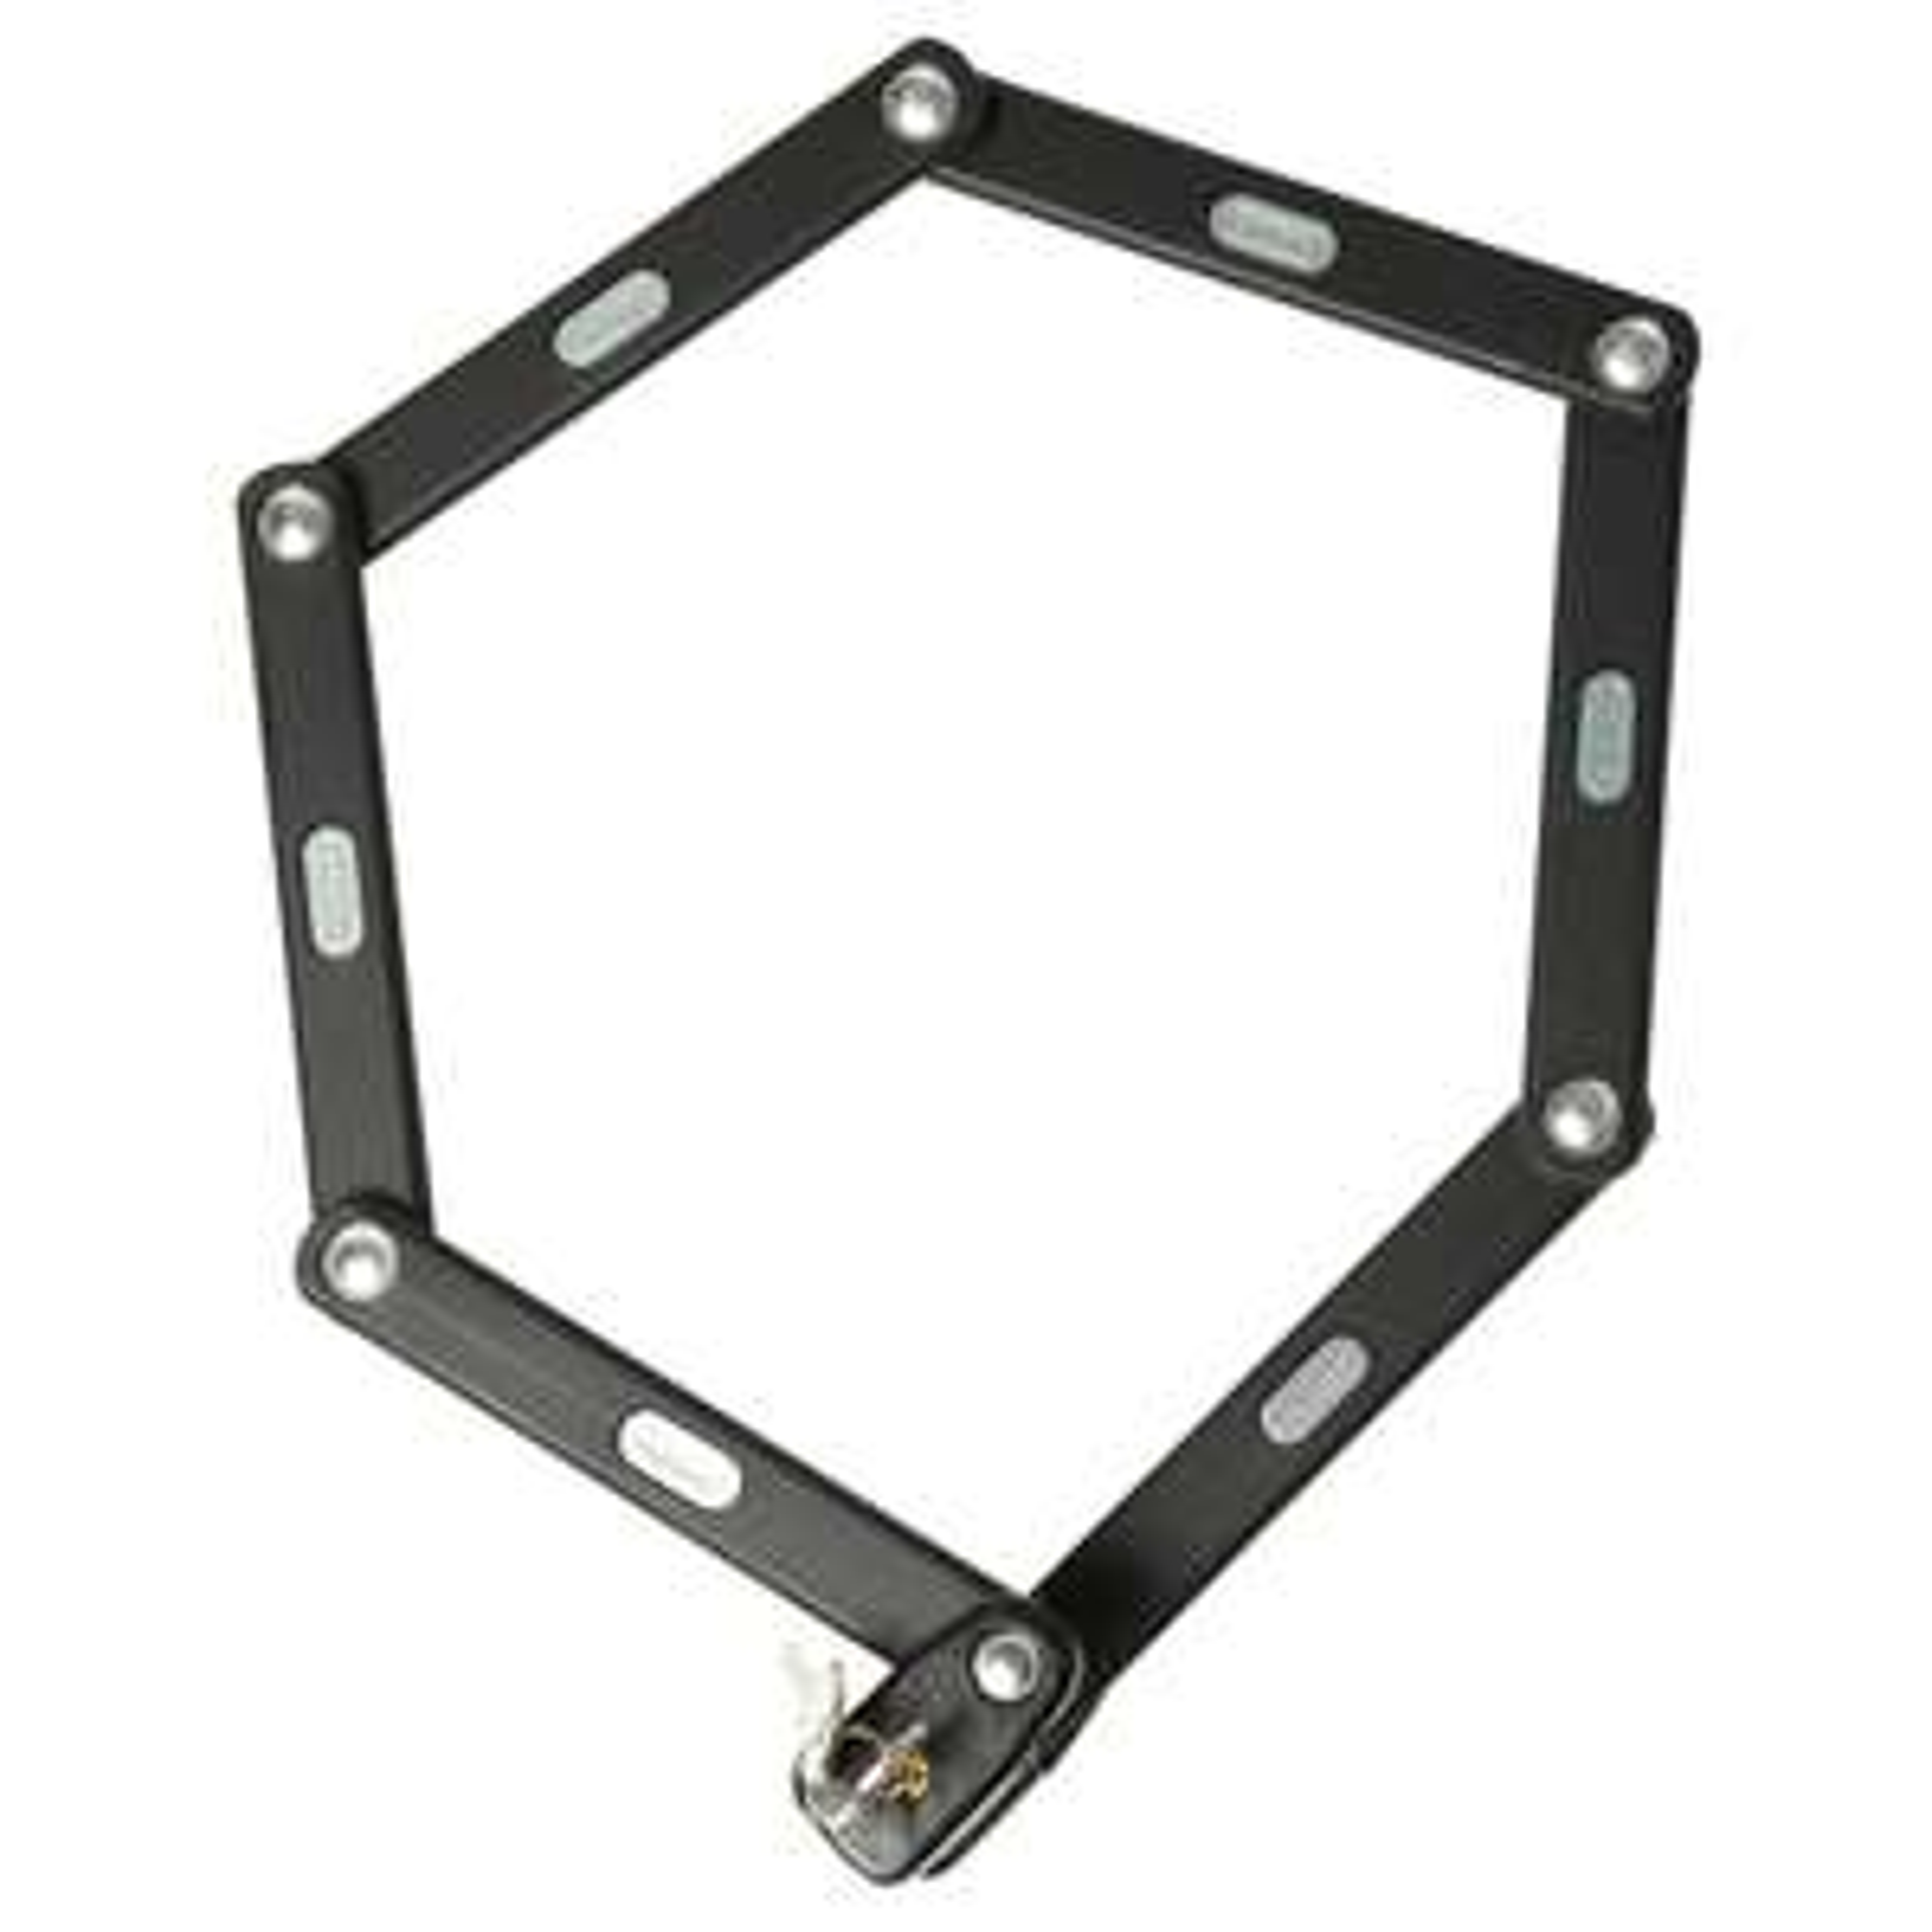 [Prime] Abus Angebote bei Amazon: z.B. ABUS Faltschloss Bordo Classic 5900/90 34,99€ I ABUS Kettenschloss Steel-O-Chain 880 110cm 27,99€